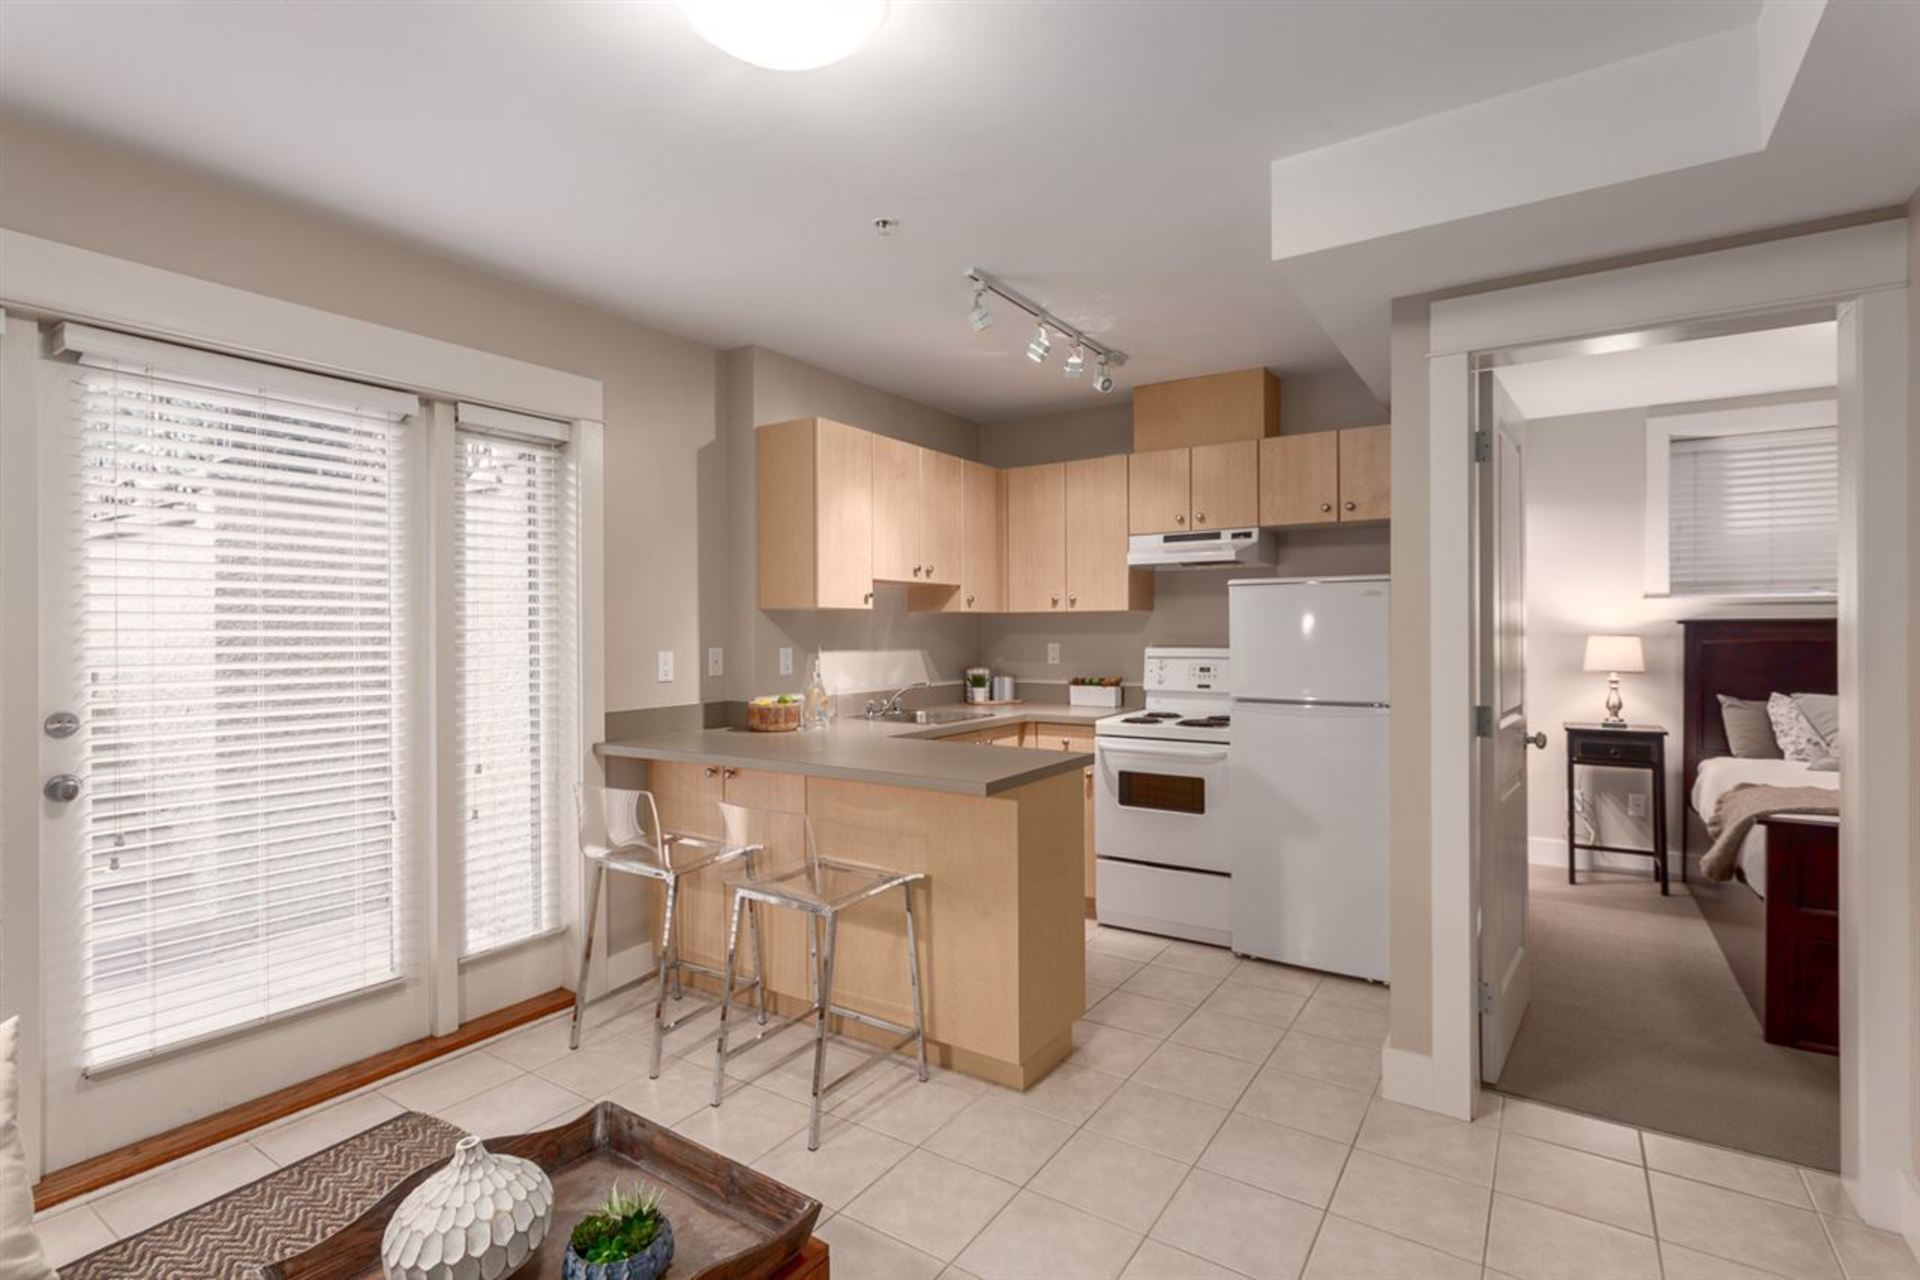 2455-cambridge-street-hastings-east-vancouver-east-18 at 2455 Cambridge Street, Hastings East, Vancouver East